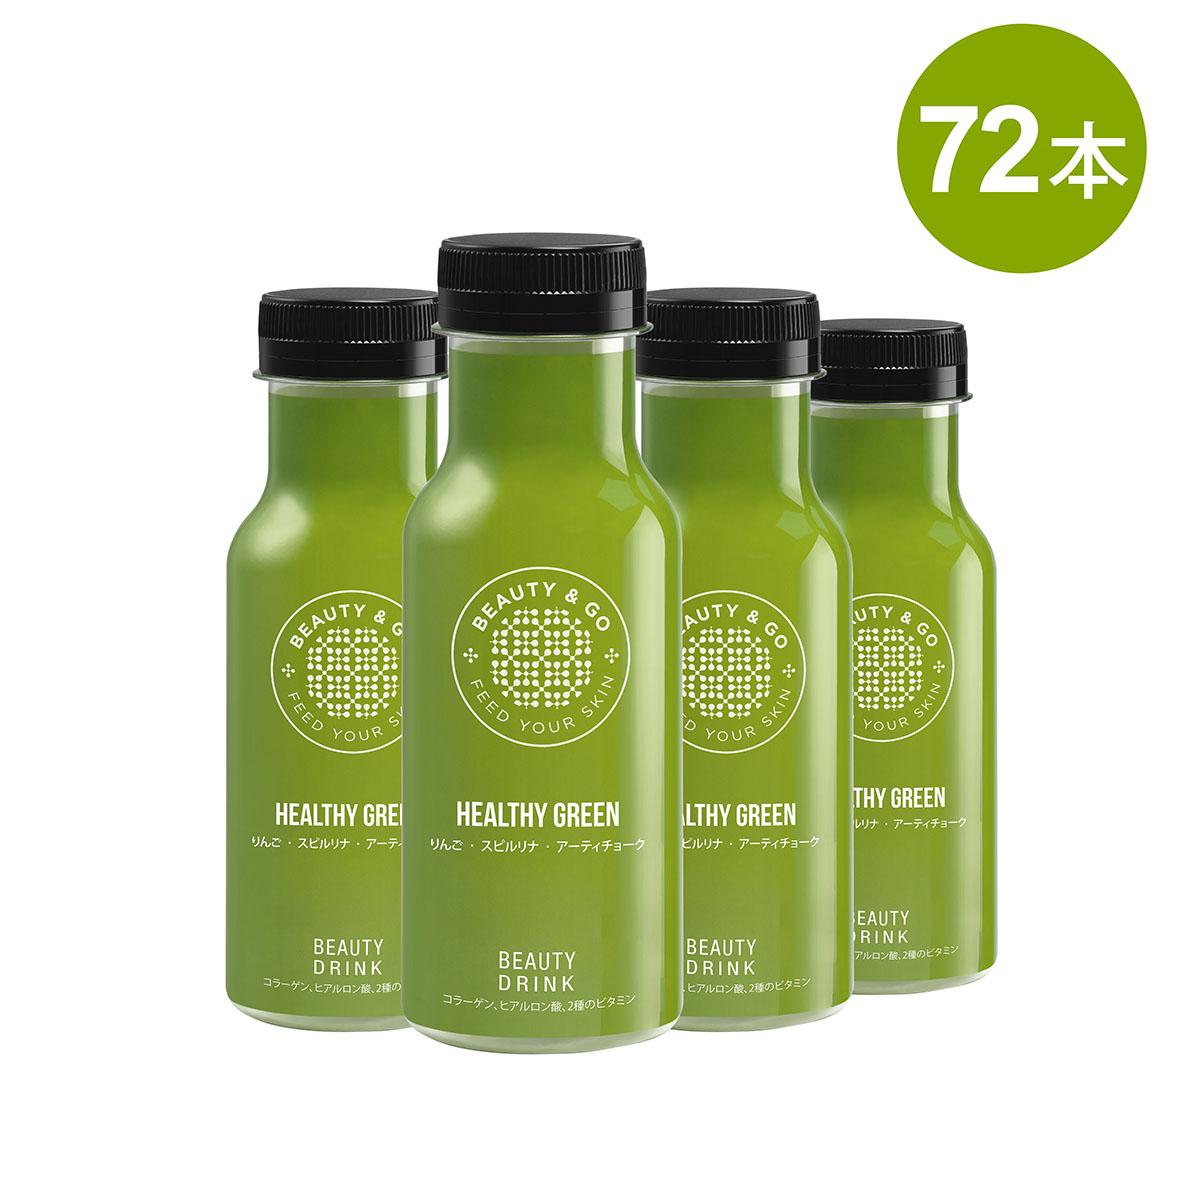 BEAUTYGO HEALTHY GREEN ヘルシーグリーン 期間限定 ― 72日間のケア 美容ドリンク 激安通販専門店 72本